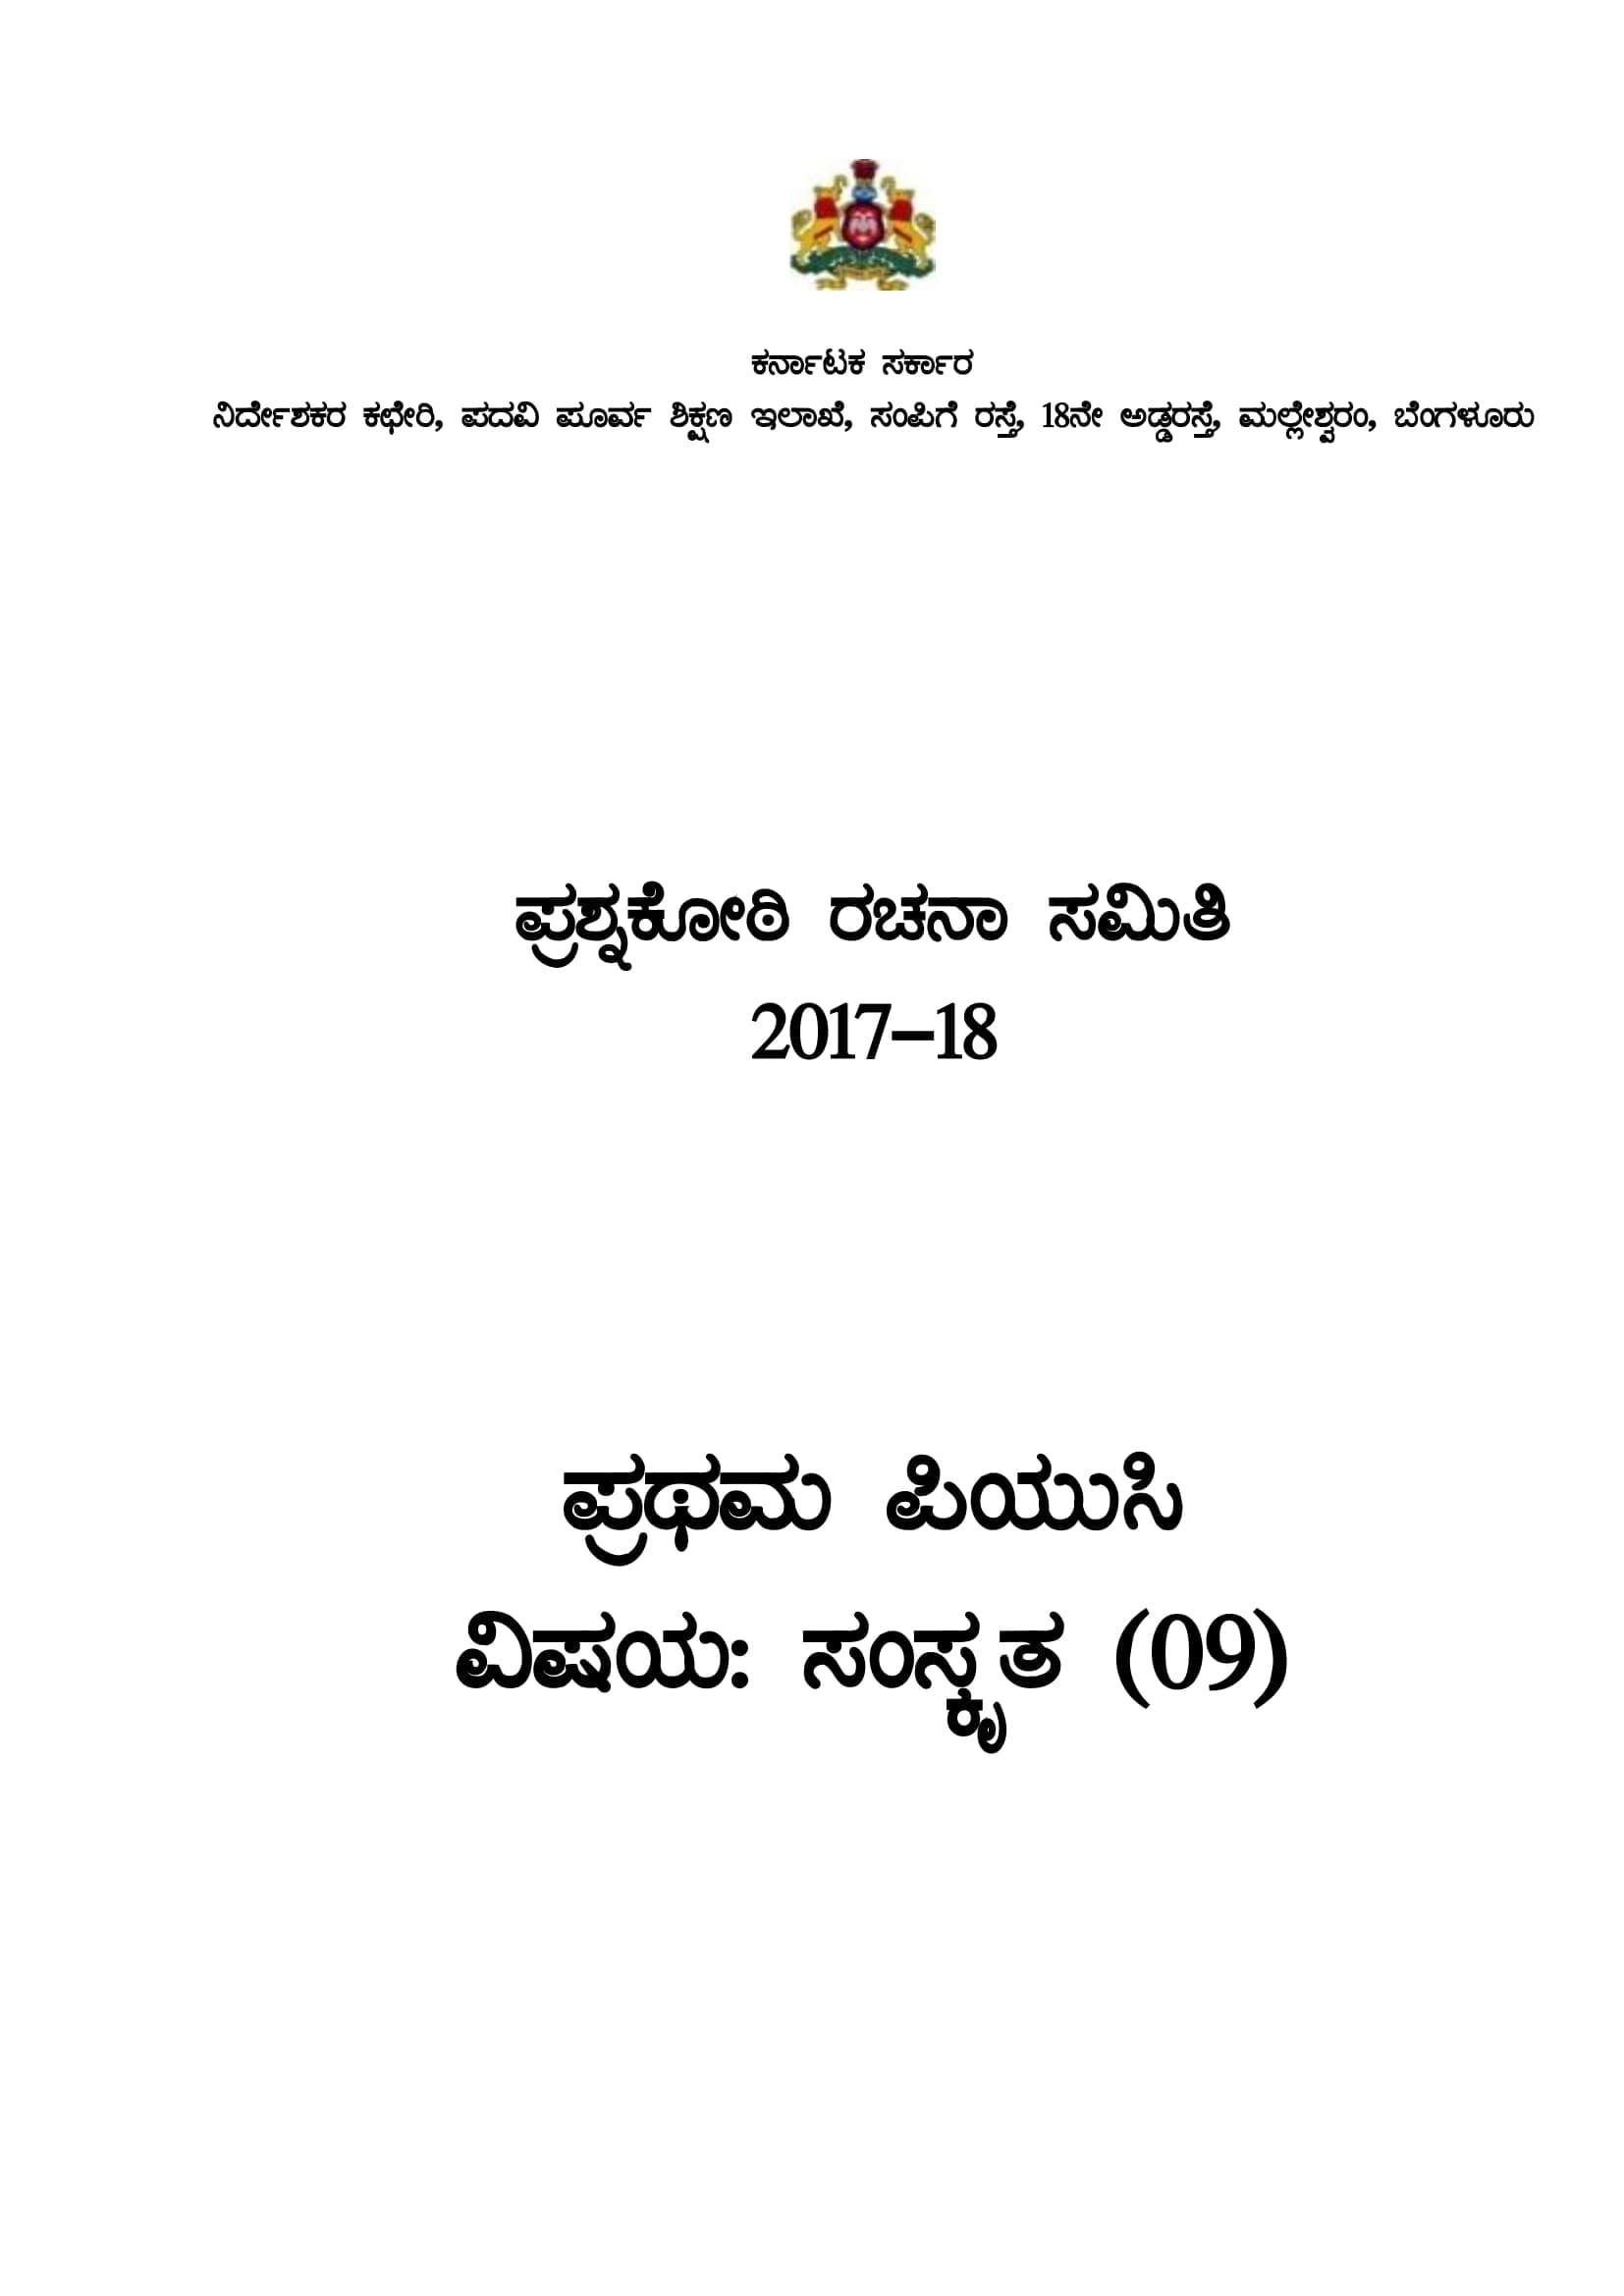 Karnataka 2nd PUC Question Bank for Sanskrit 2017-18 - Page 1